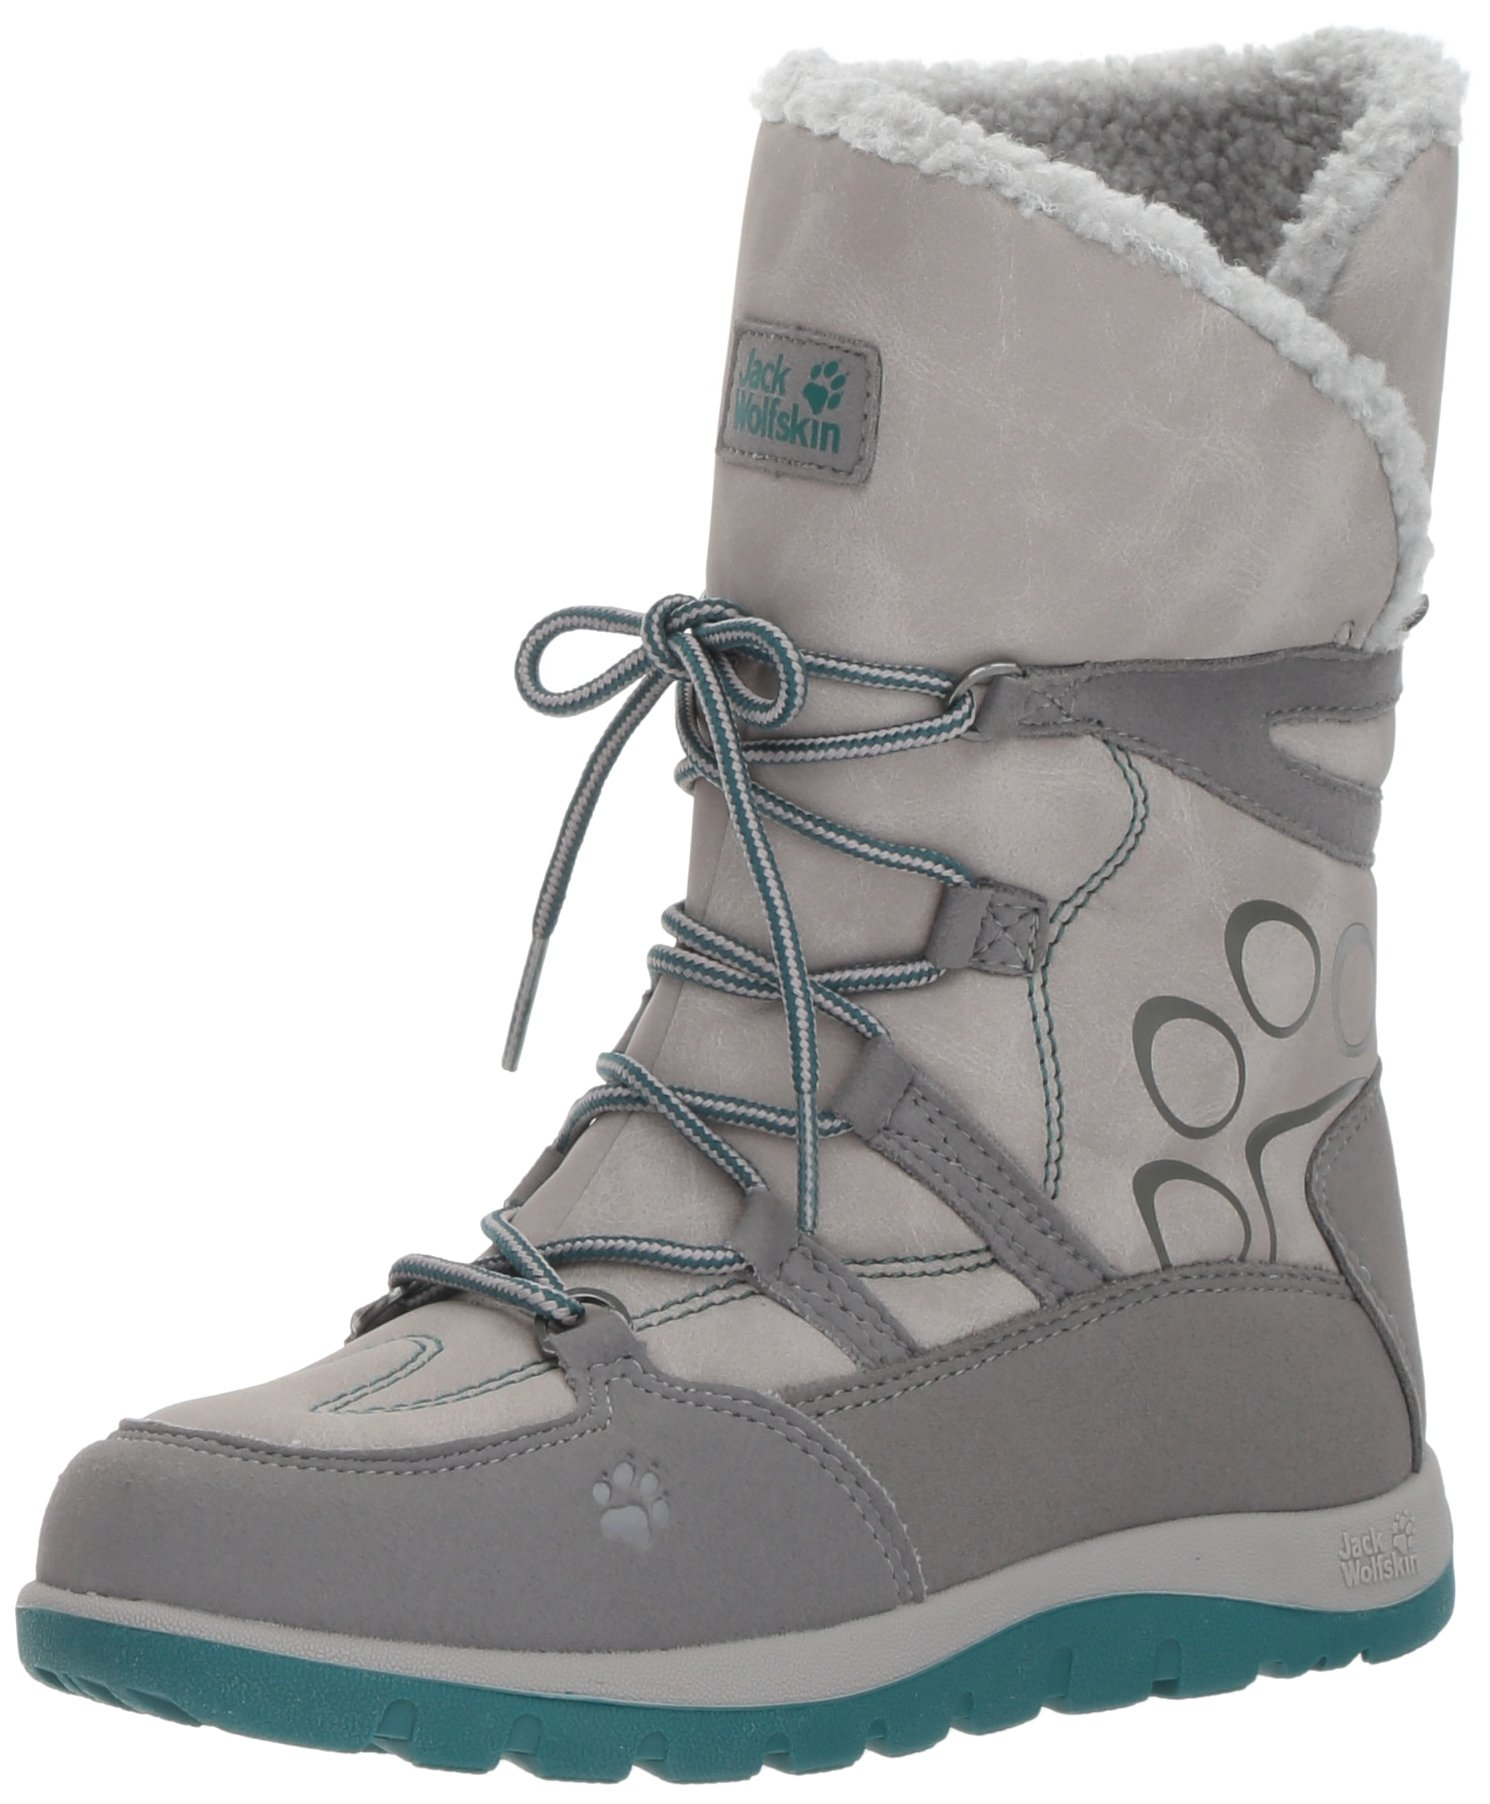 Jack Wolfskin Girls' Rhode Island Texapore High G Snow Boot, Alloy, 3.5 N US Little Kid